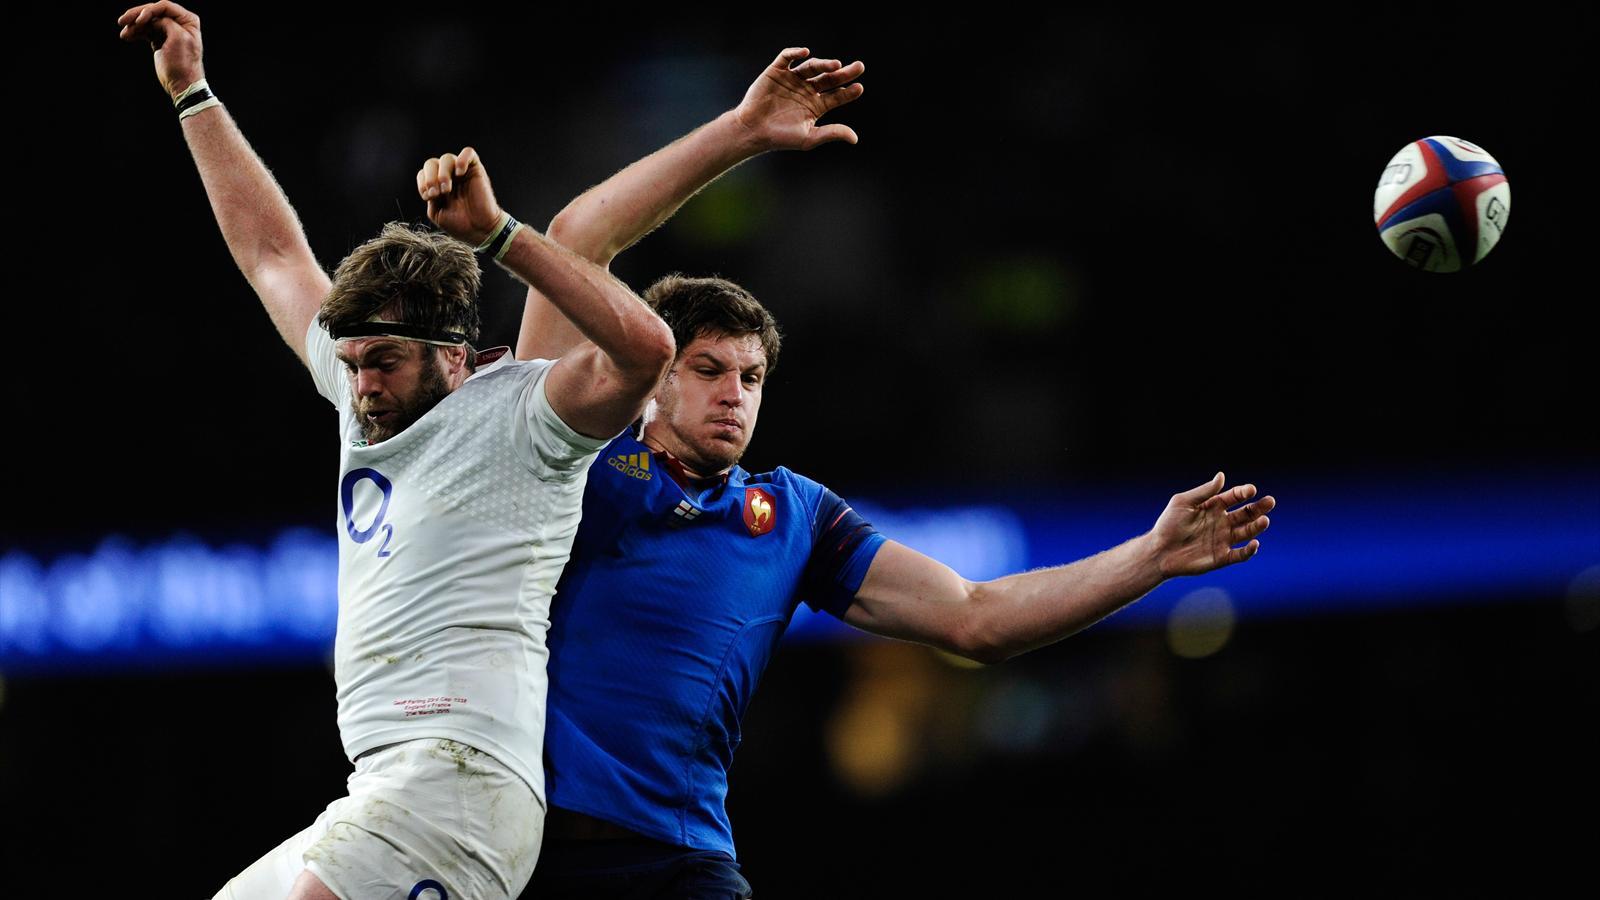 Geoff Parling - Alexandre Flanquart. Angleterre-France, 21 mars 2015